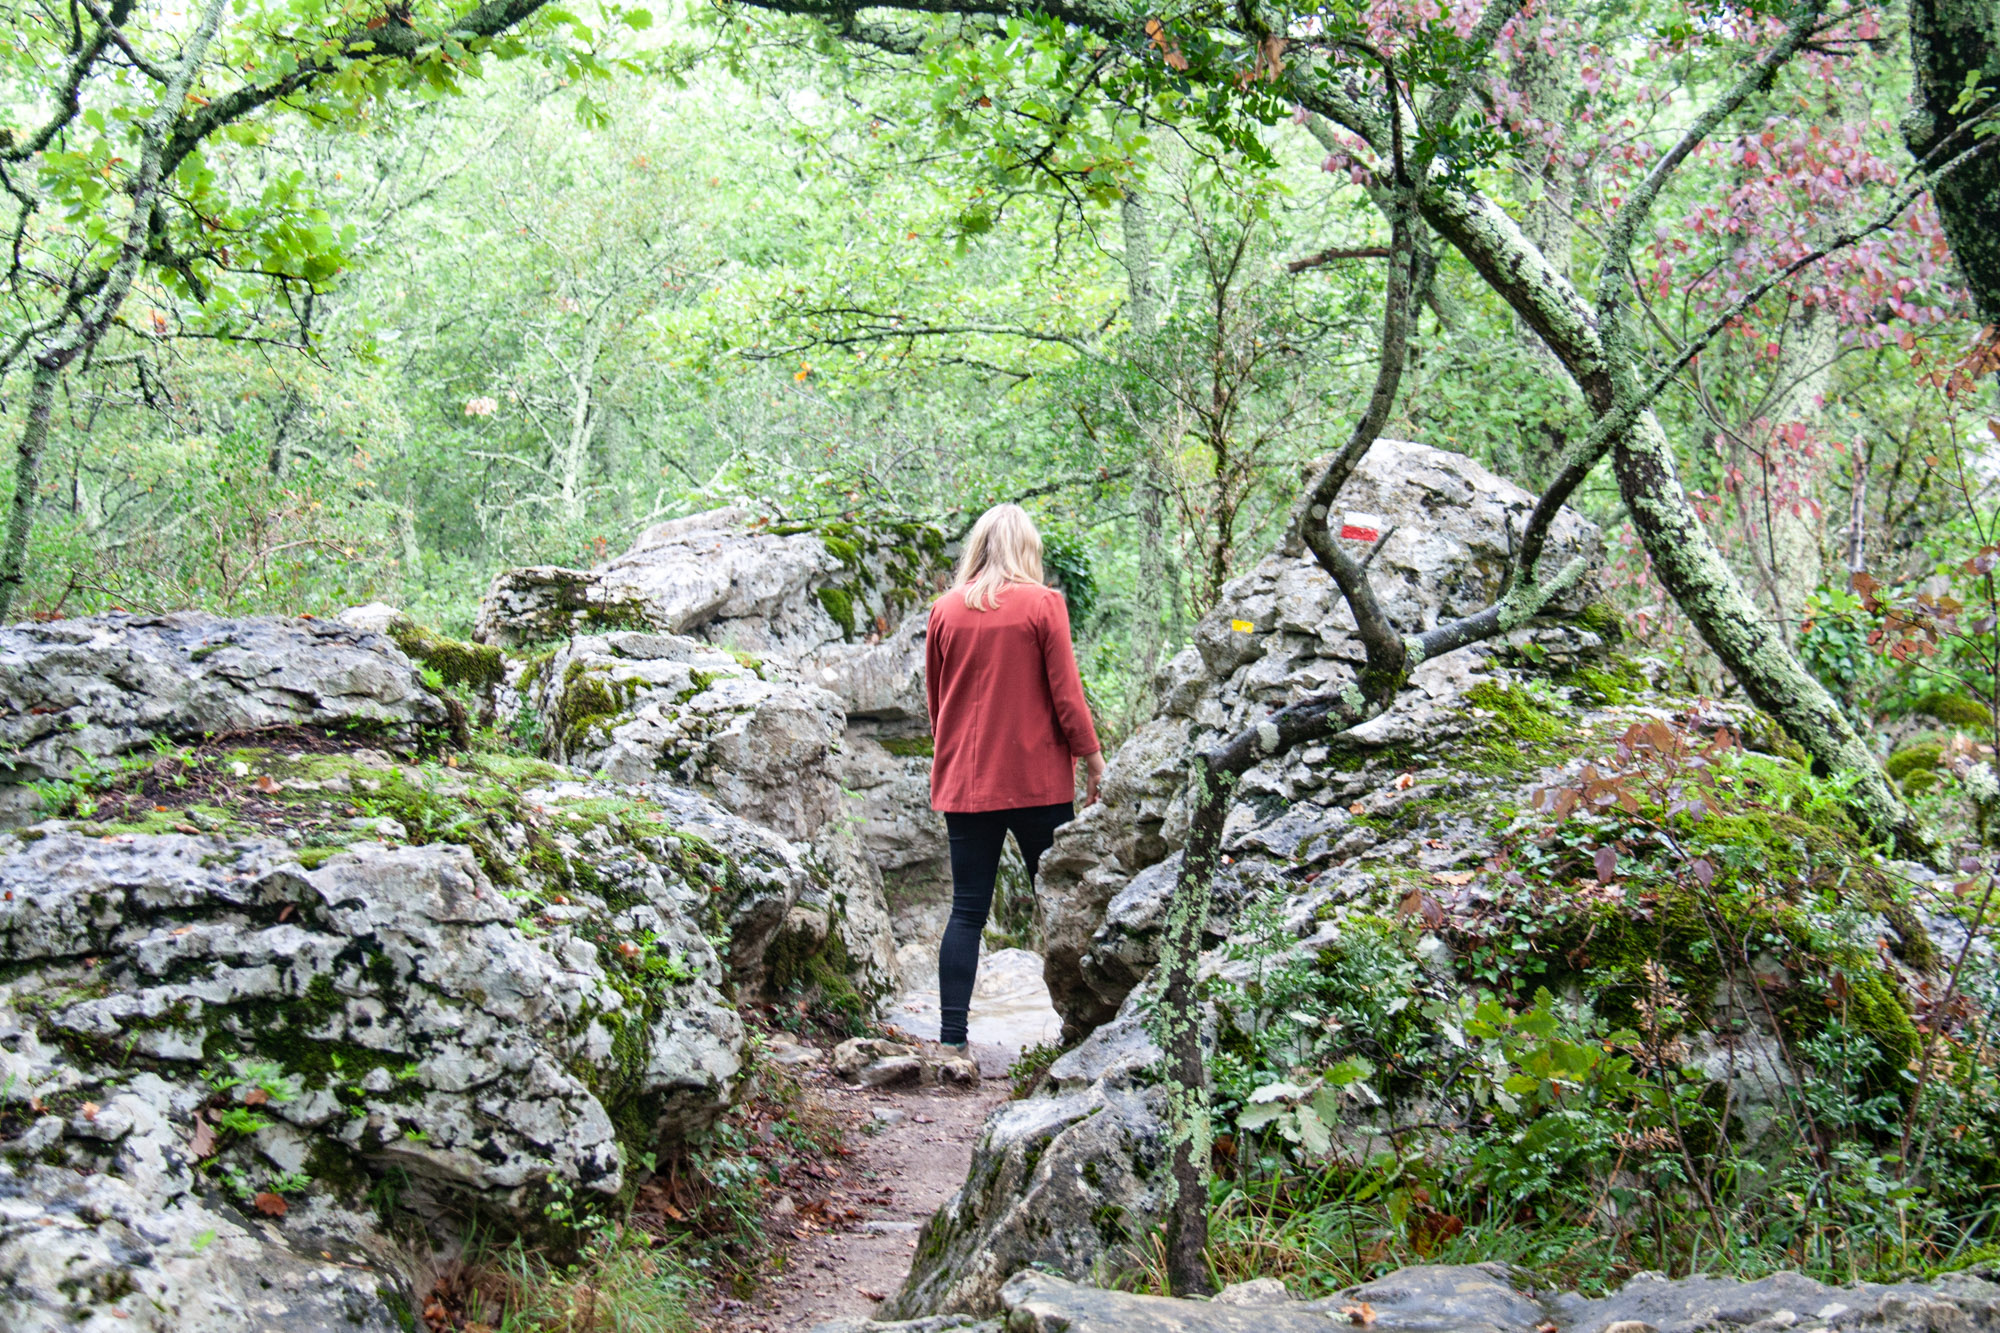 Boïs de Païolive, wandeling Ardèche